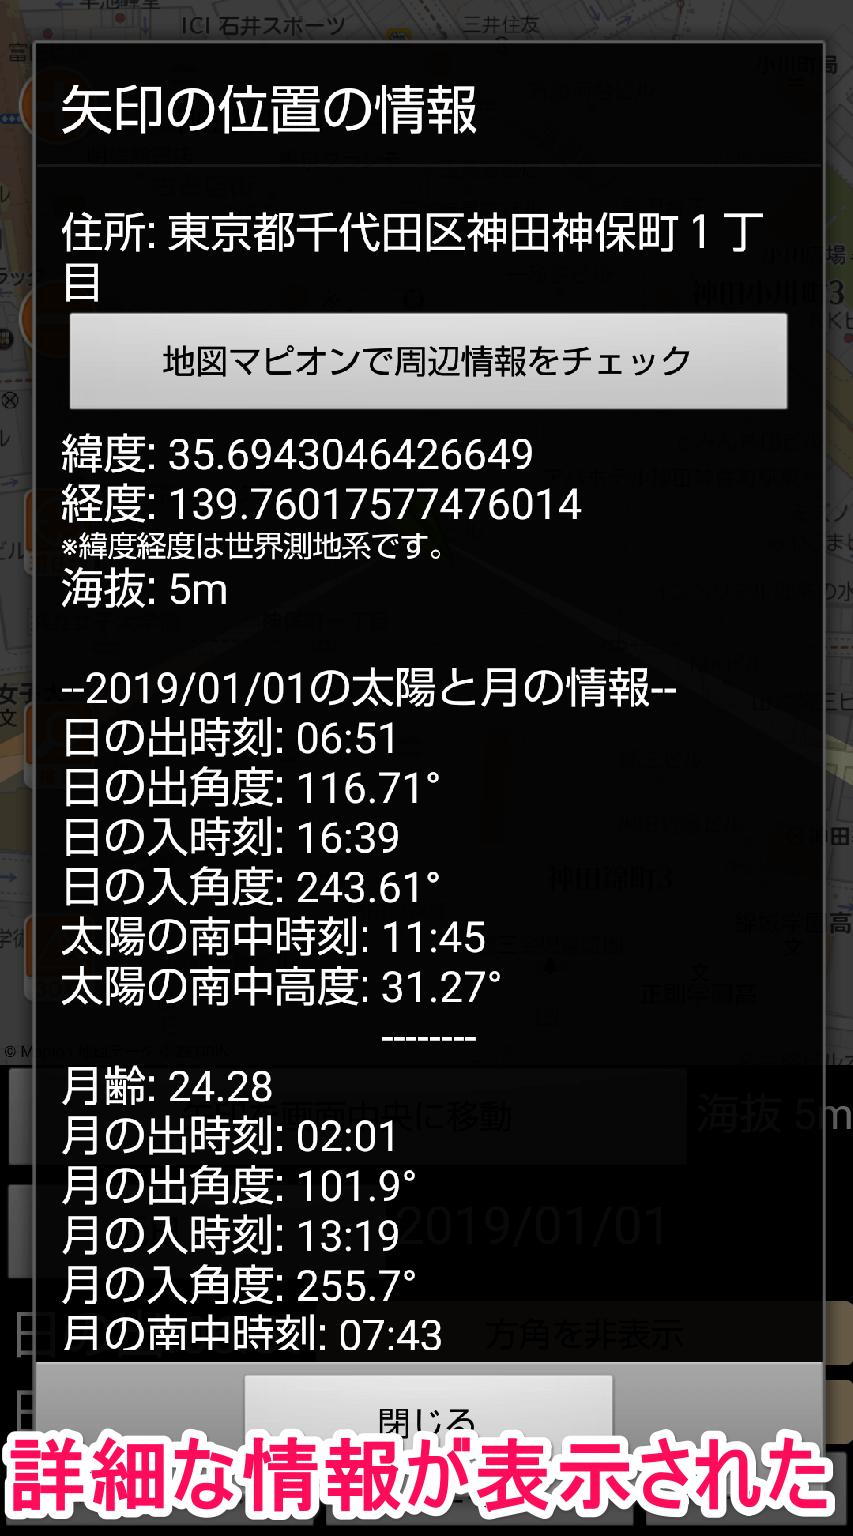 Android(アンドロイド)版[日の出日の入マピオン]アプリで好きな場所をブックマークに登録する画面